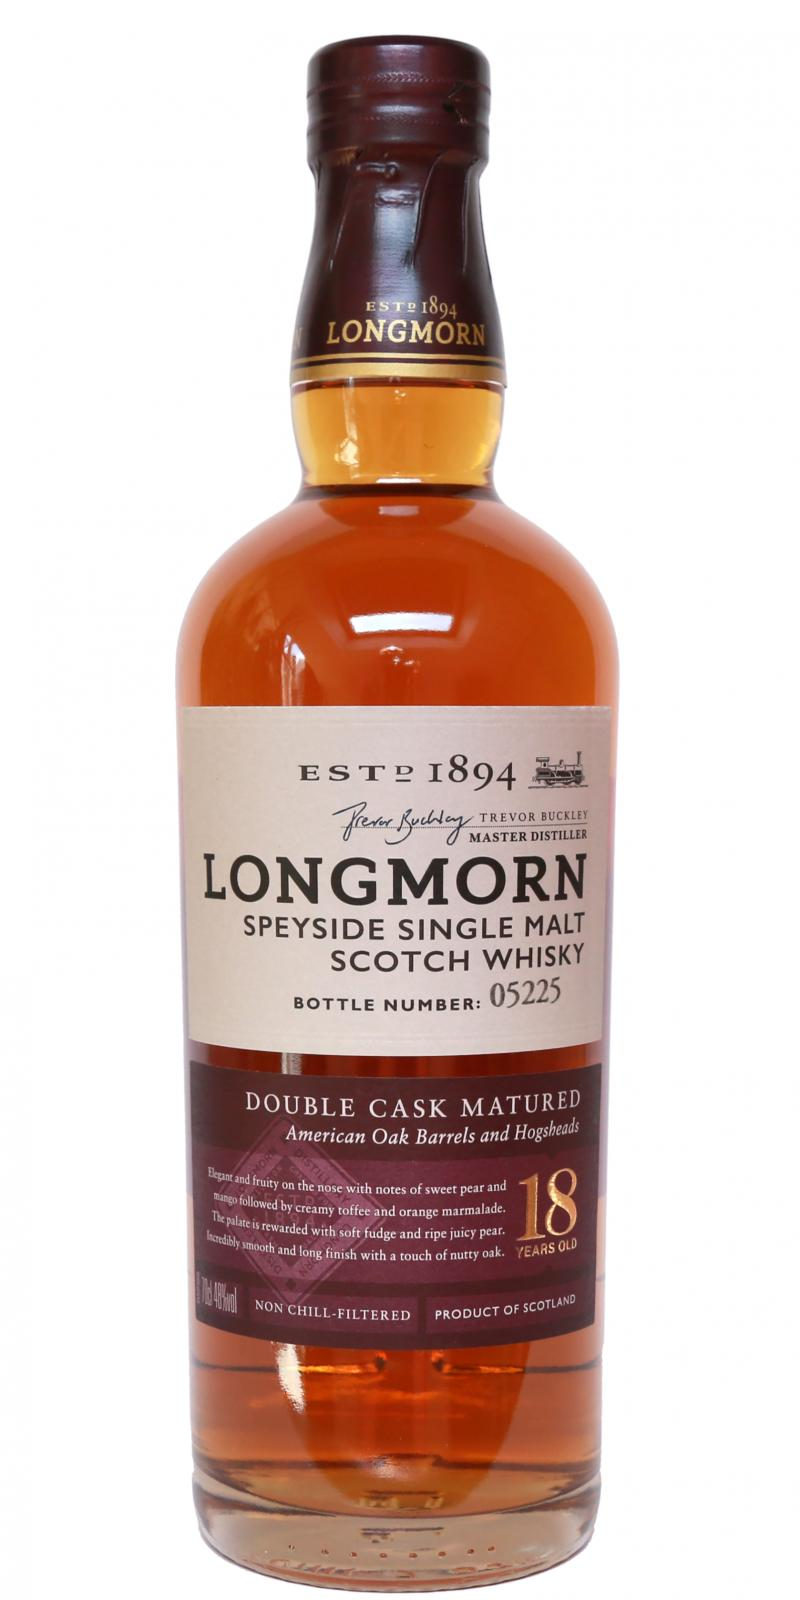 Longmorn 18-year-old